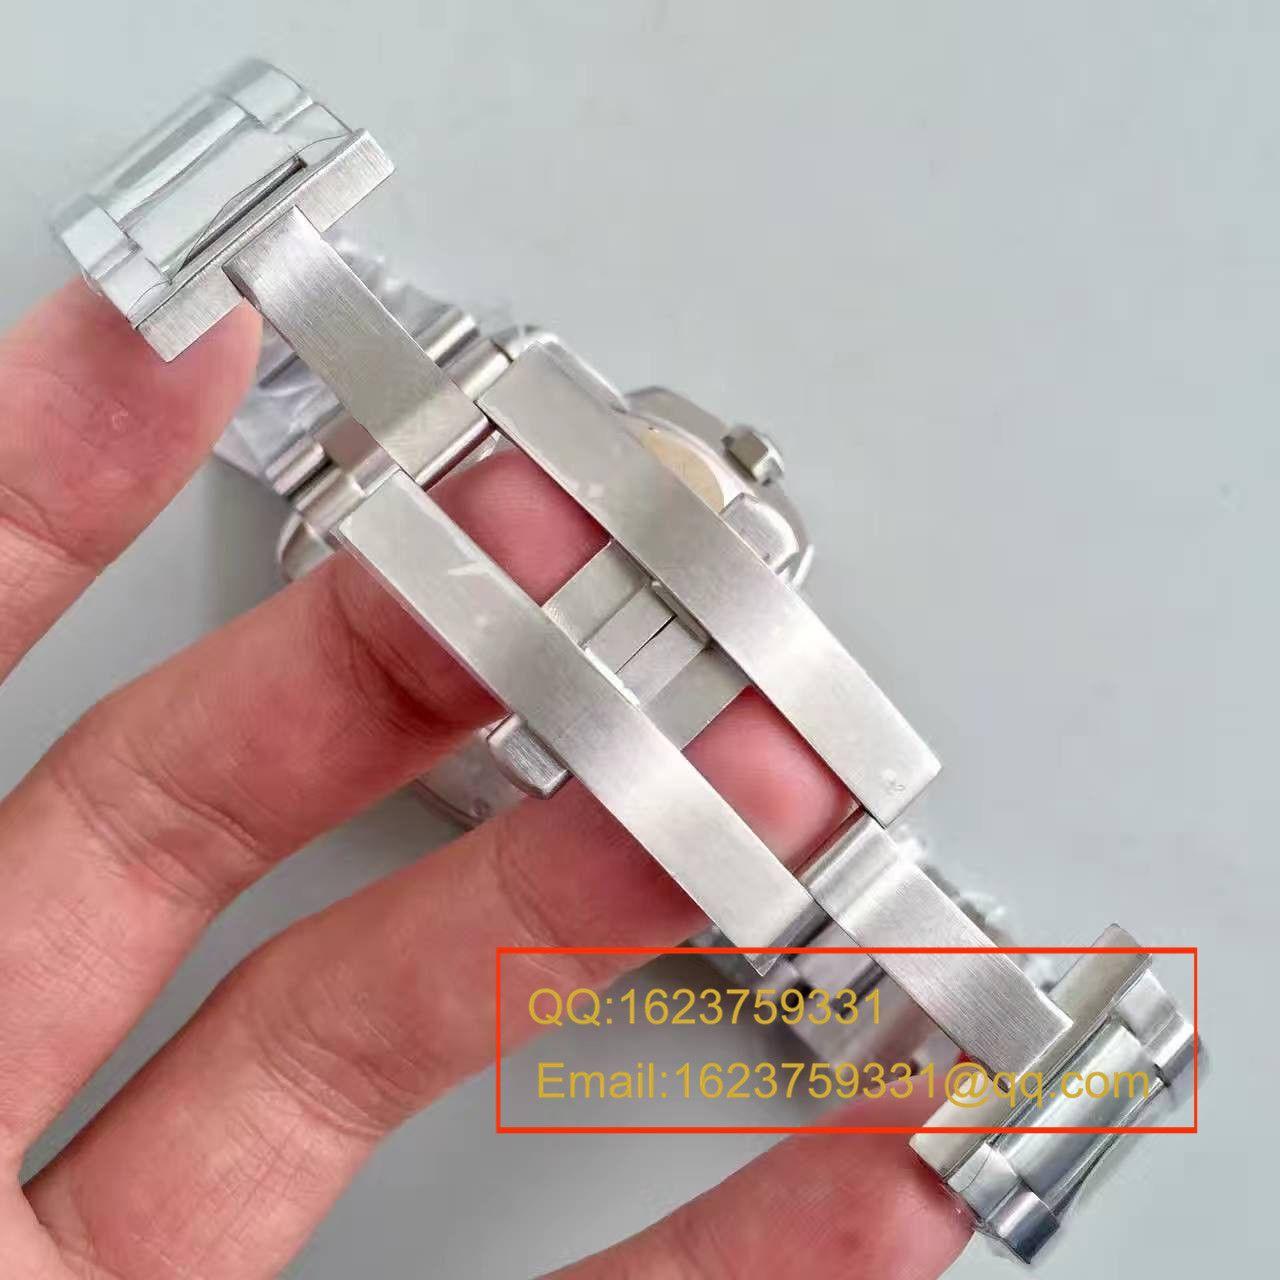 【JF厂顶级1:1复刻手表】卡地亚 CALIBRE DE CARTIER 系列 W7100016 腕表 精钢表带 / KDY024